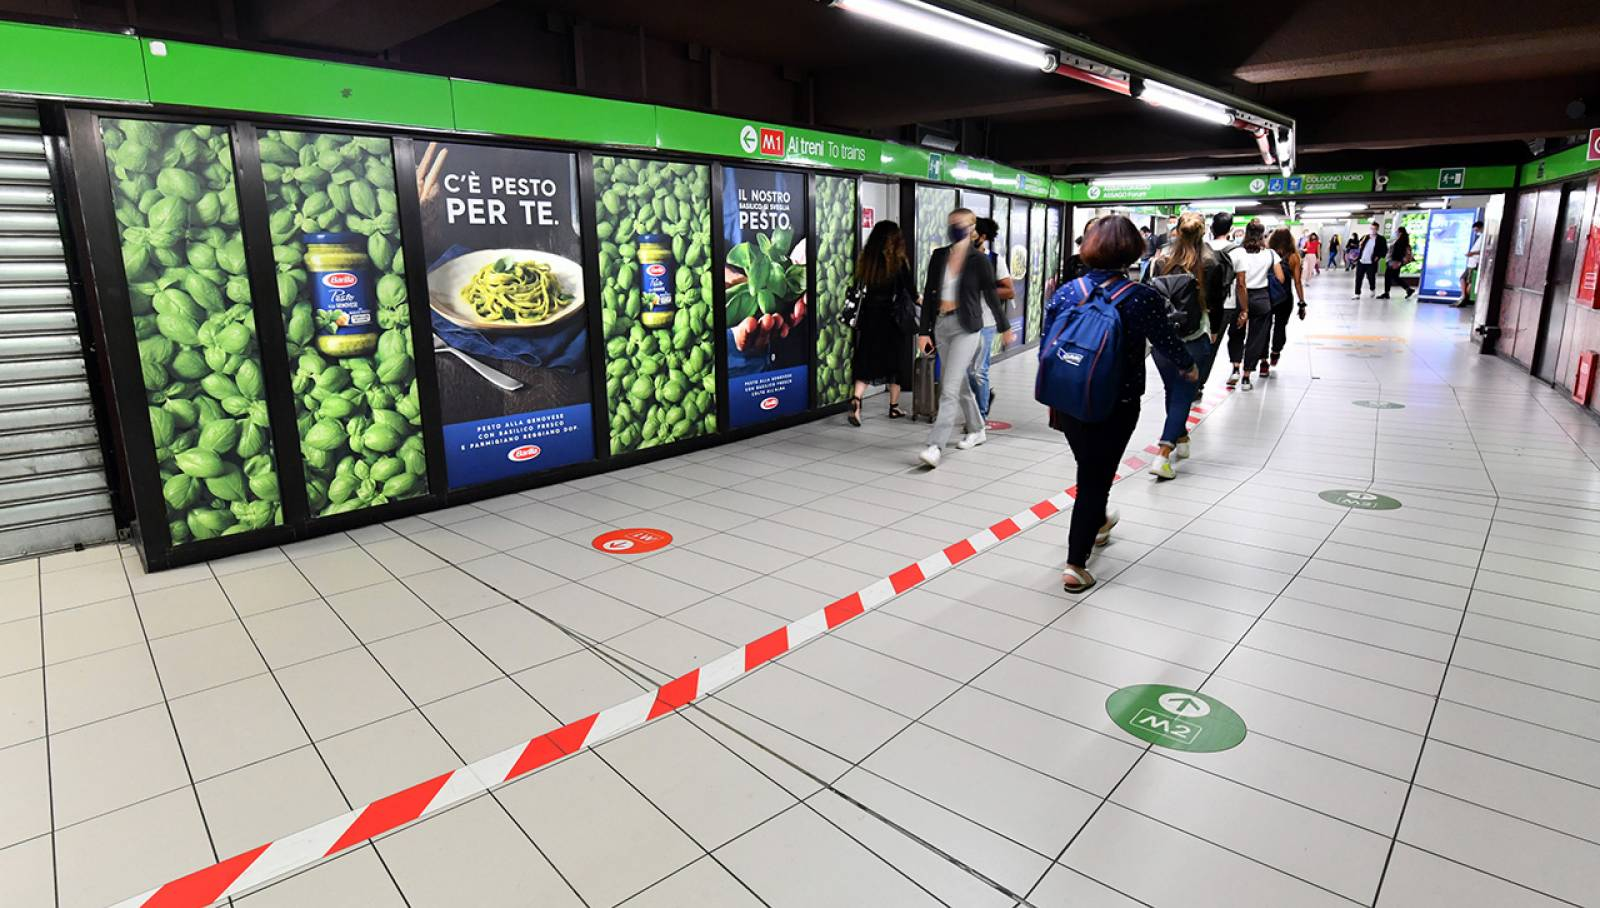 OOH IGPDecaux Milano Station Domination Cadorna per Barilla